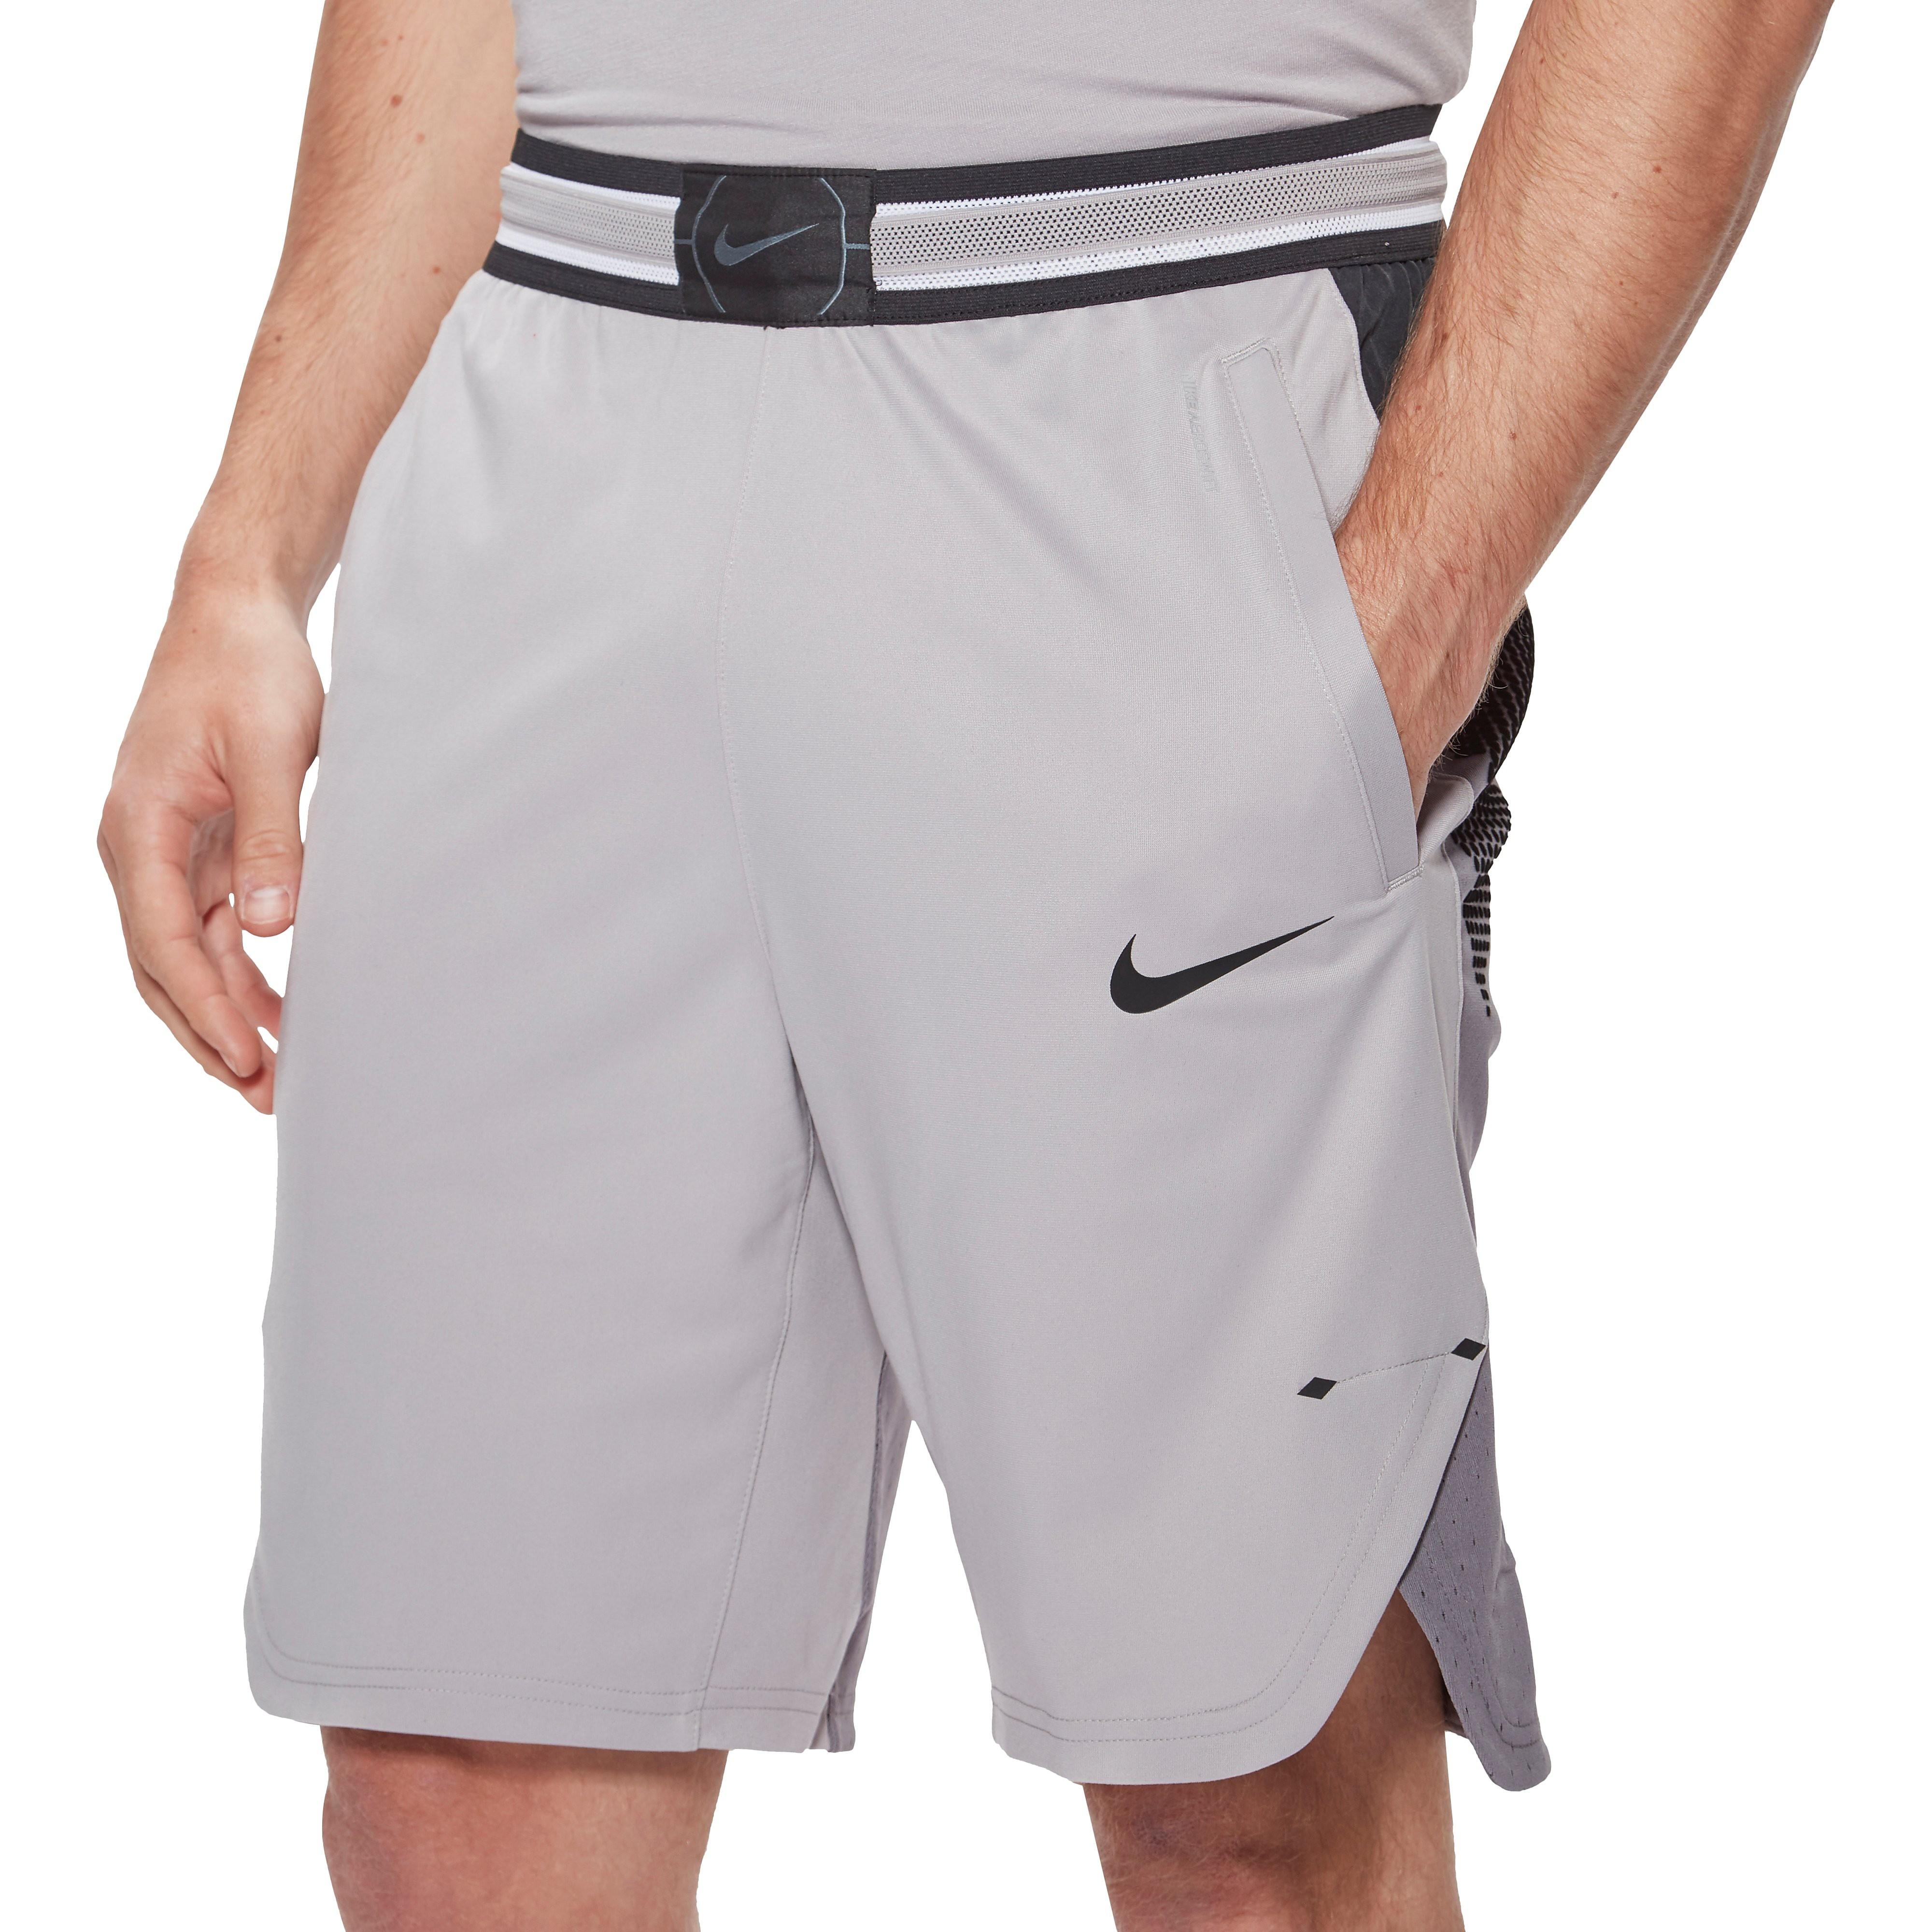 "Nike AeroSwift 9"" Men's Basketball Shorts"